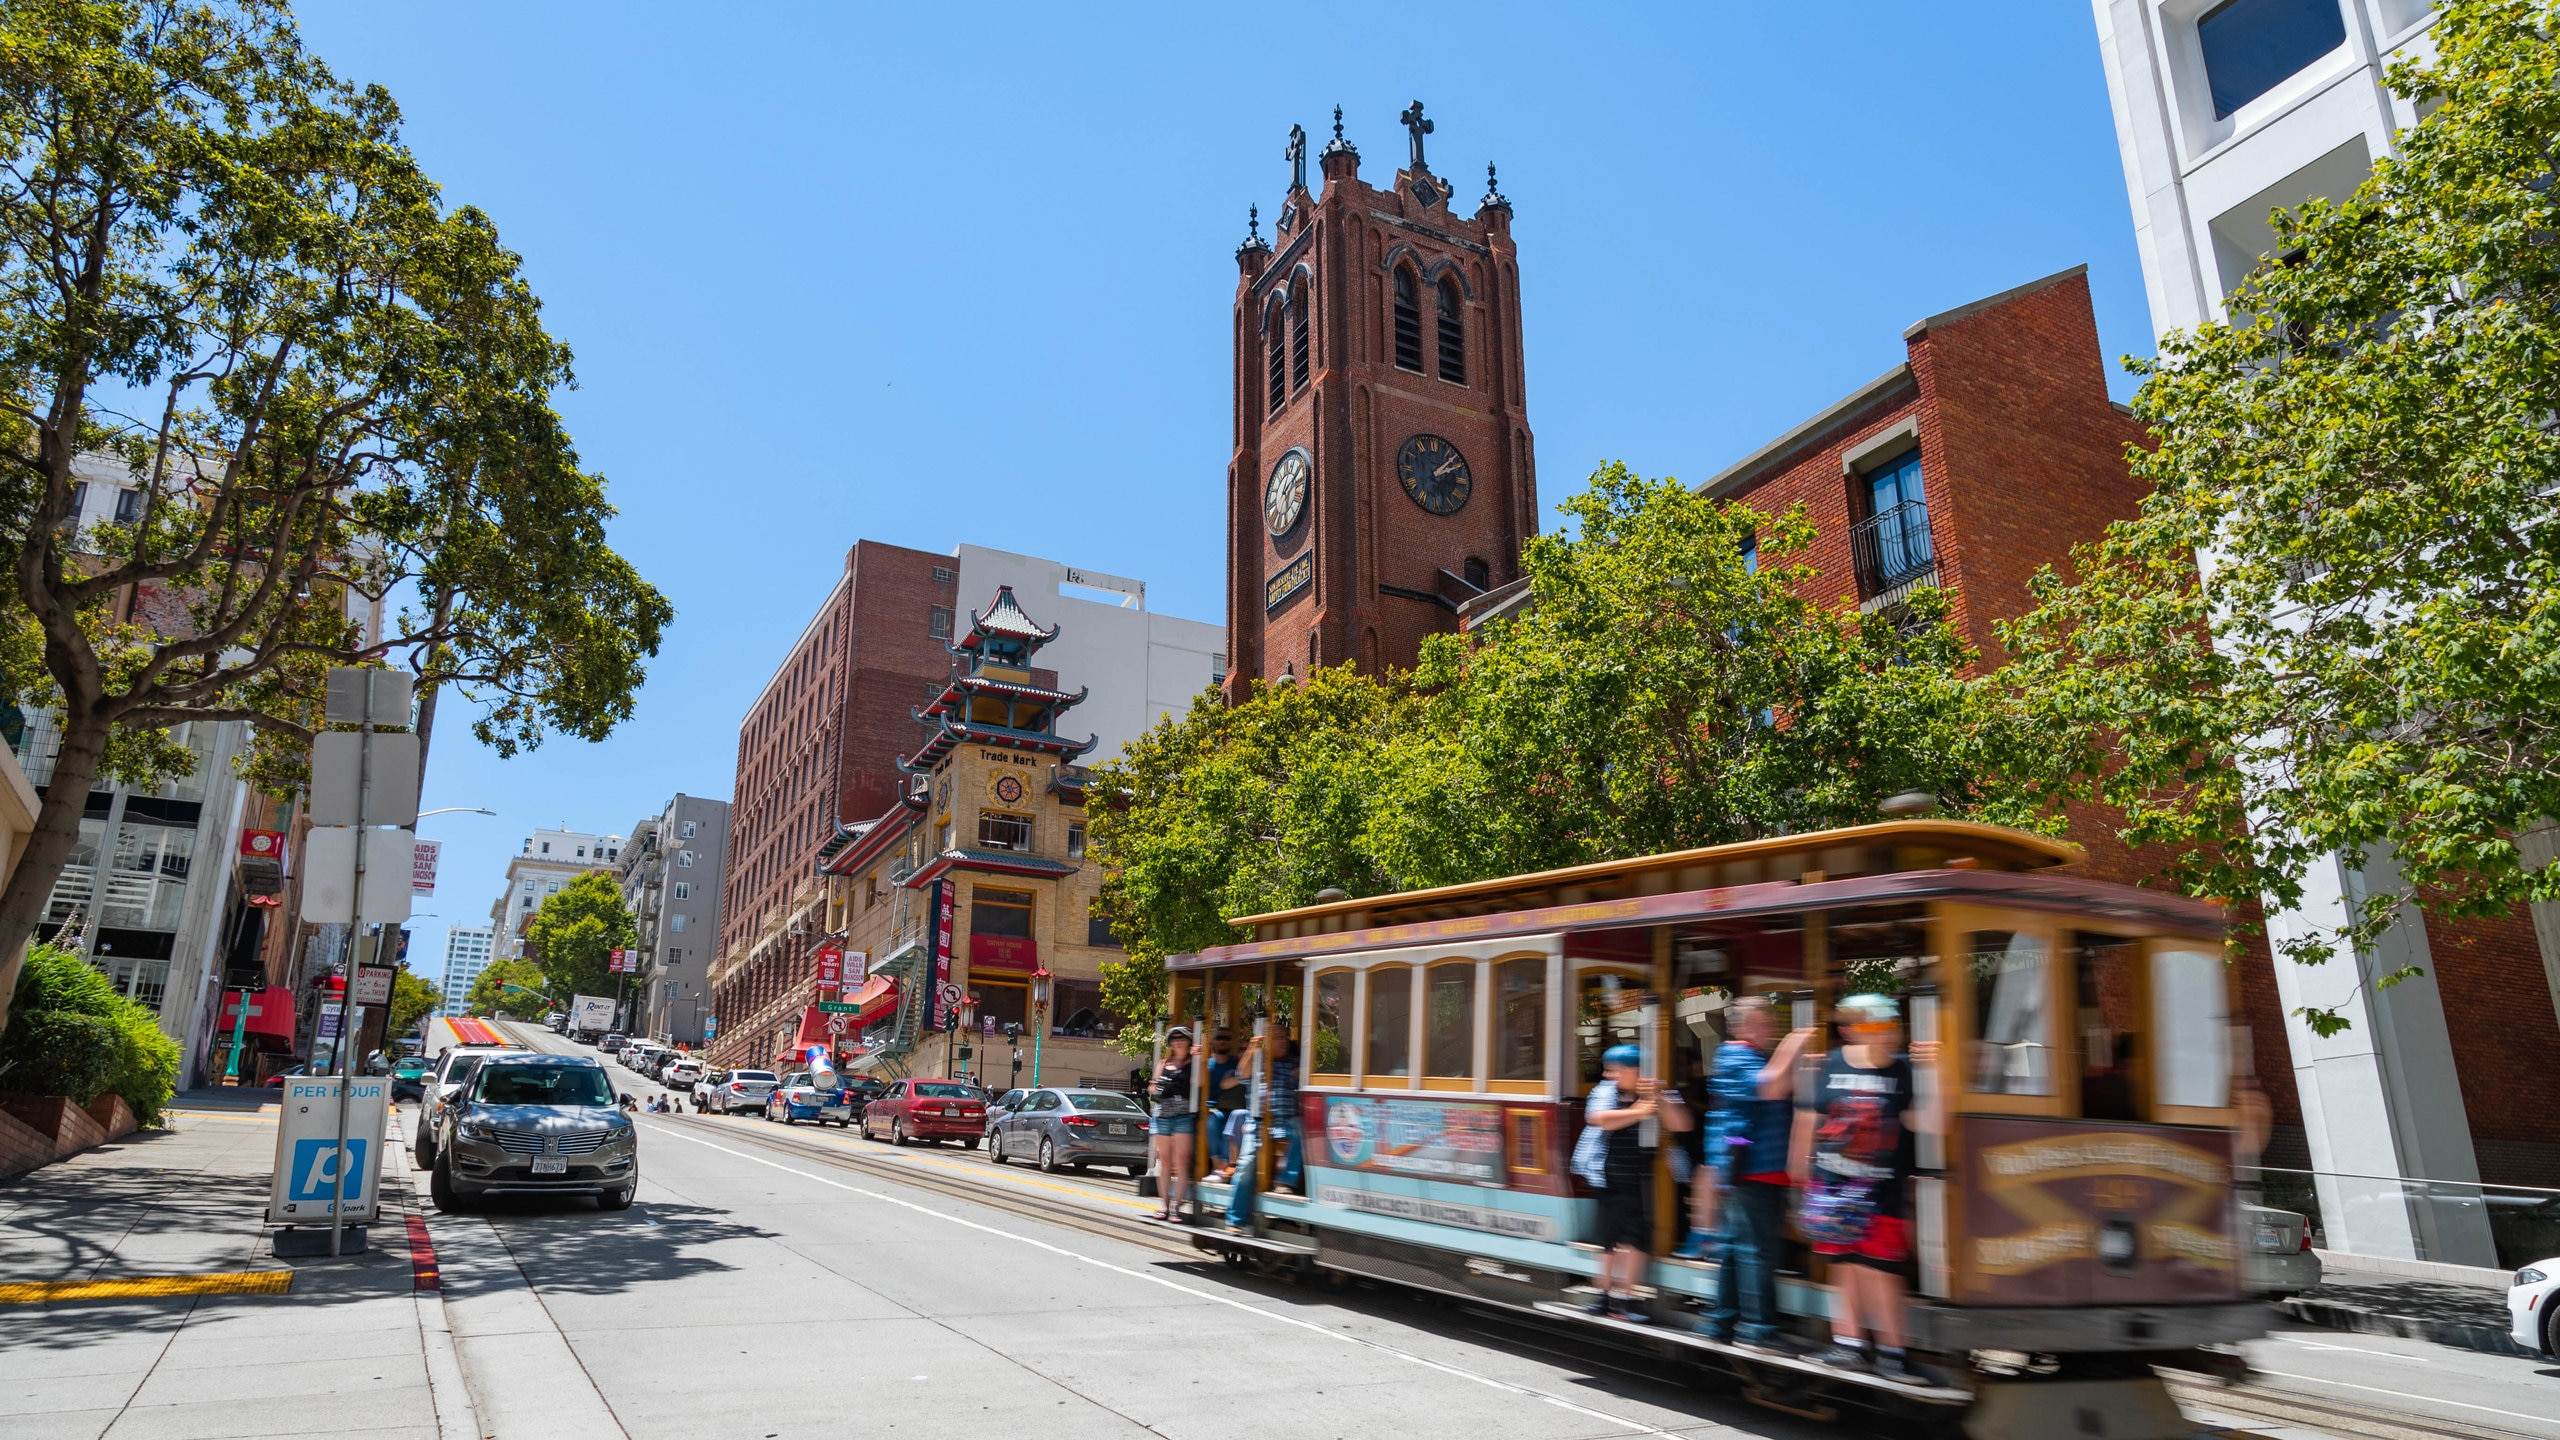 Downtown San Francisco, San Francisco, California, United States of America